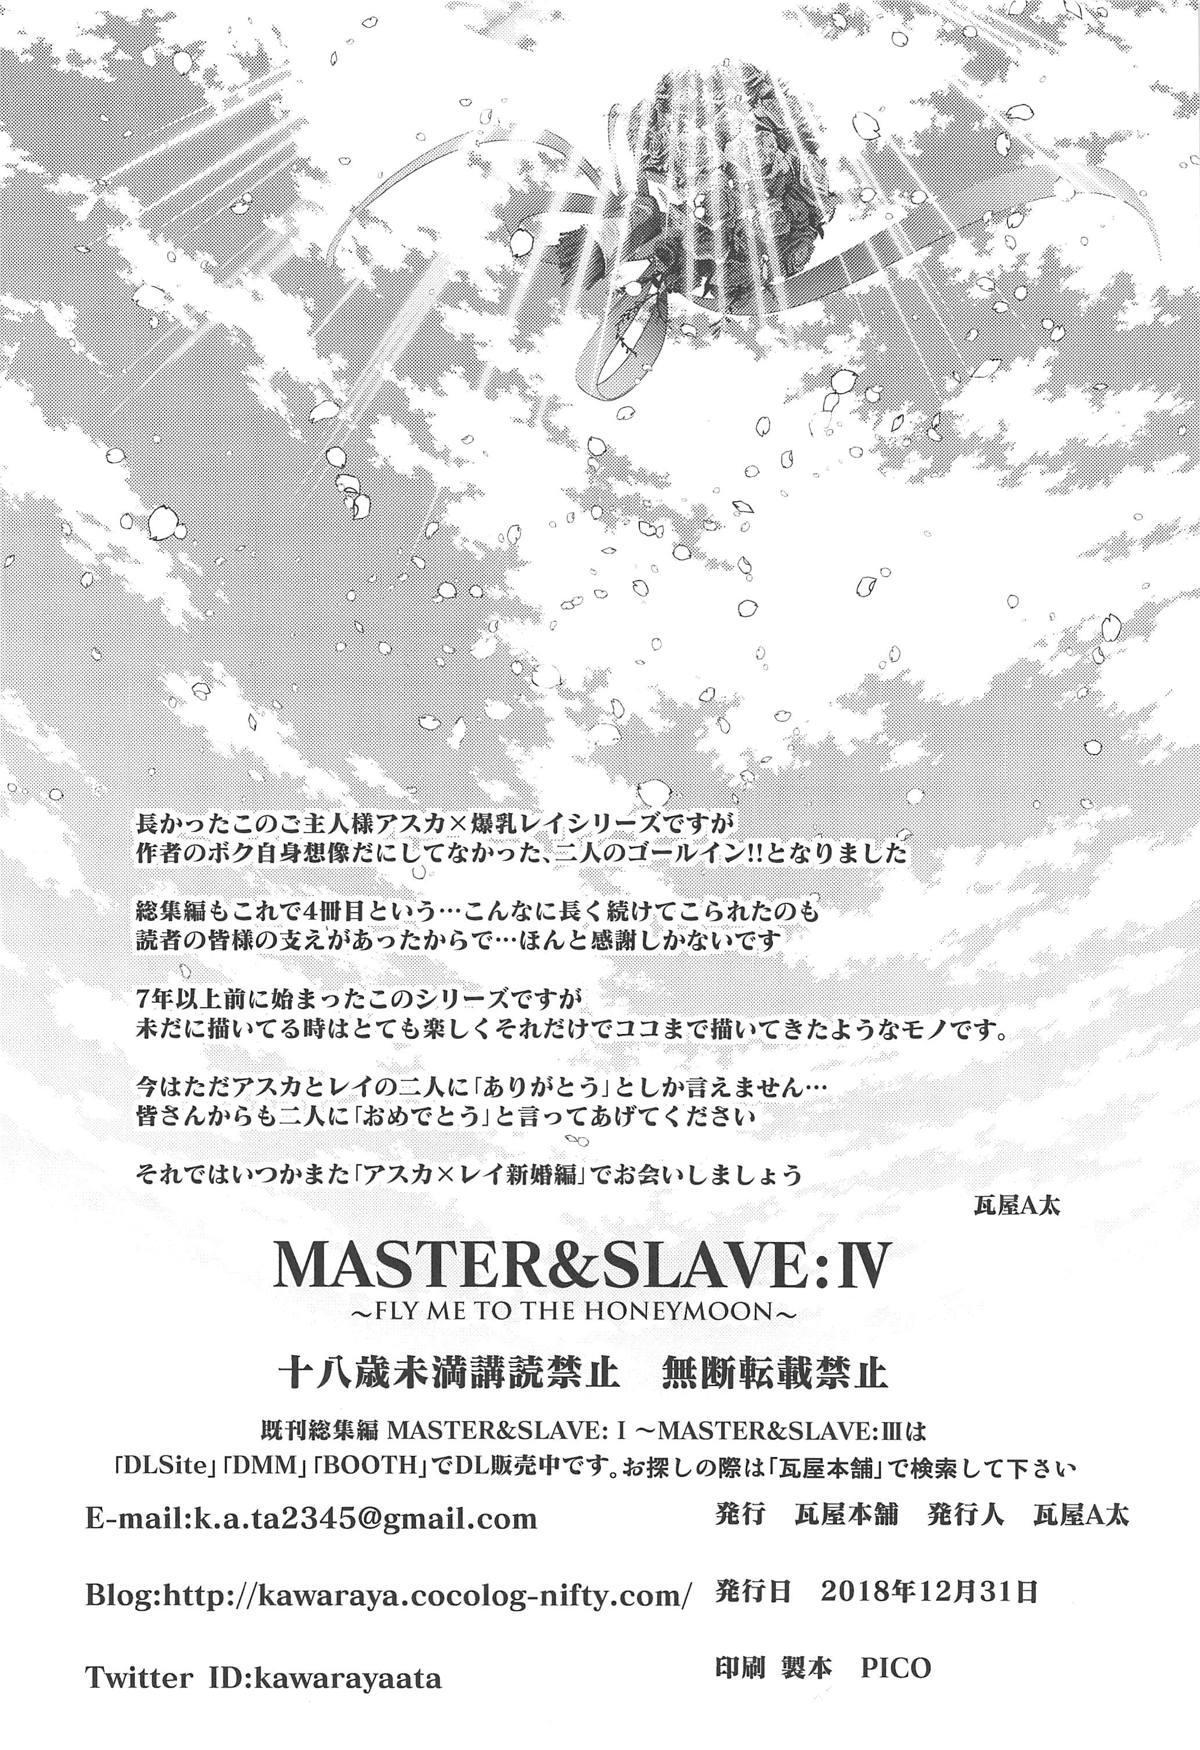 MASTER&SLAVE:IV 147